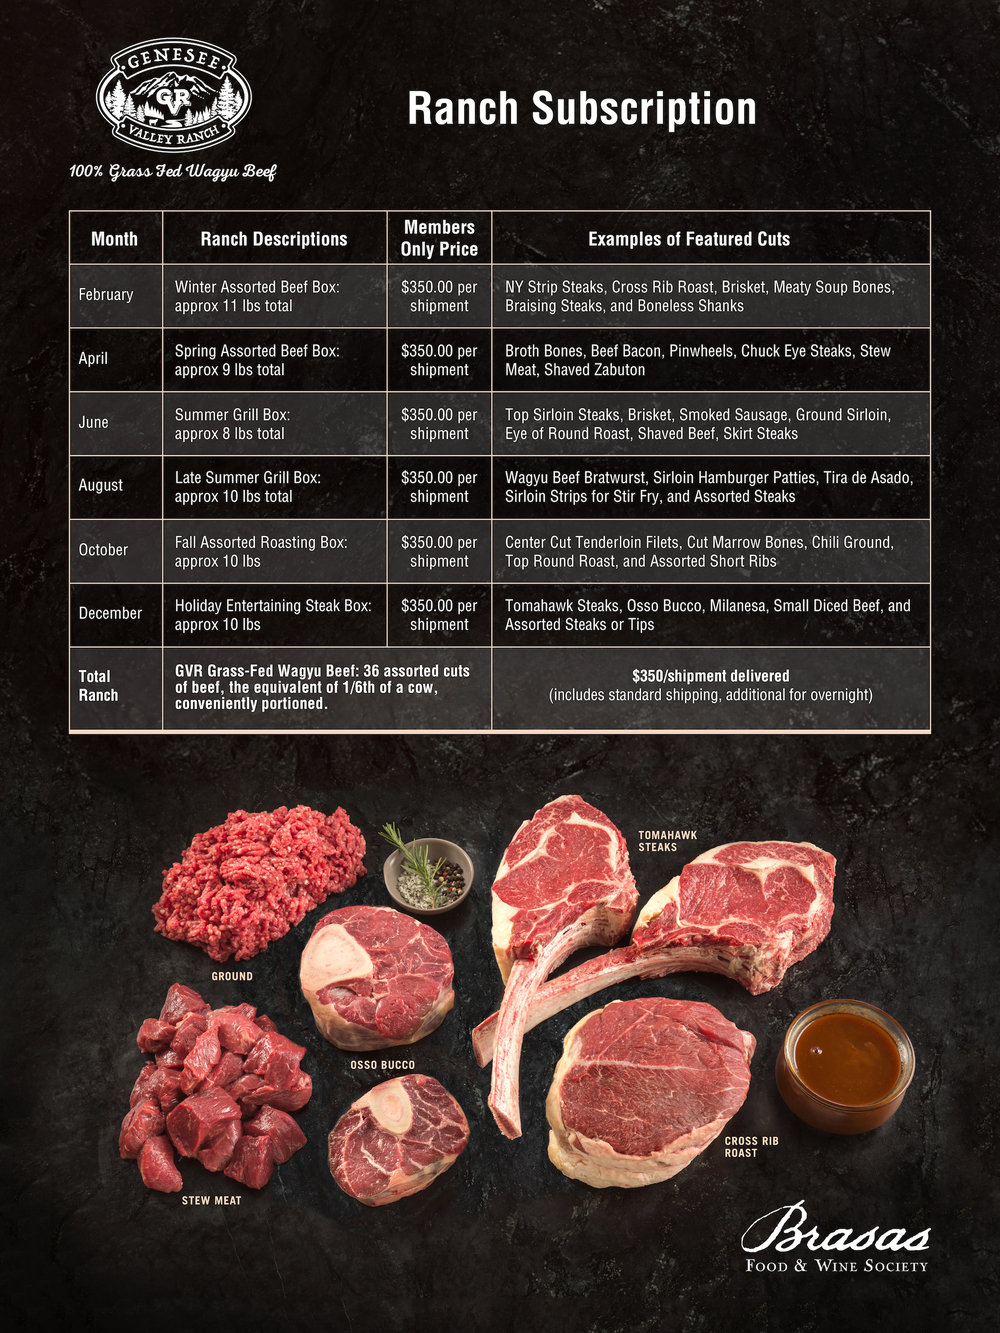 92-meatcuts.jpg